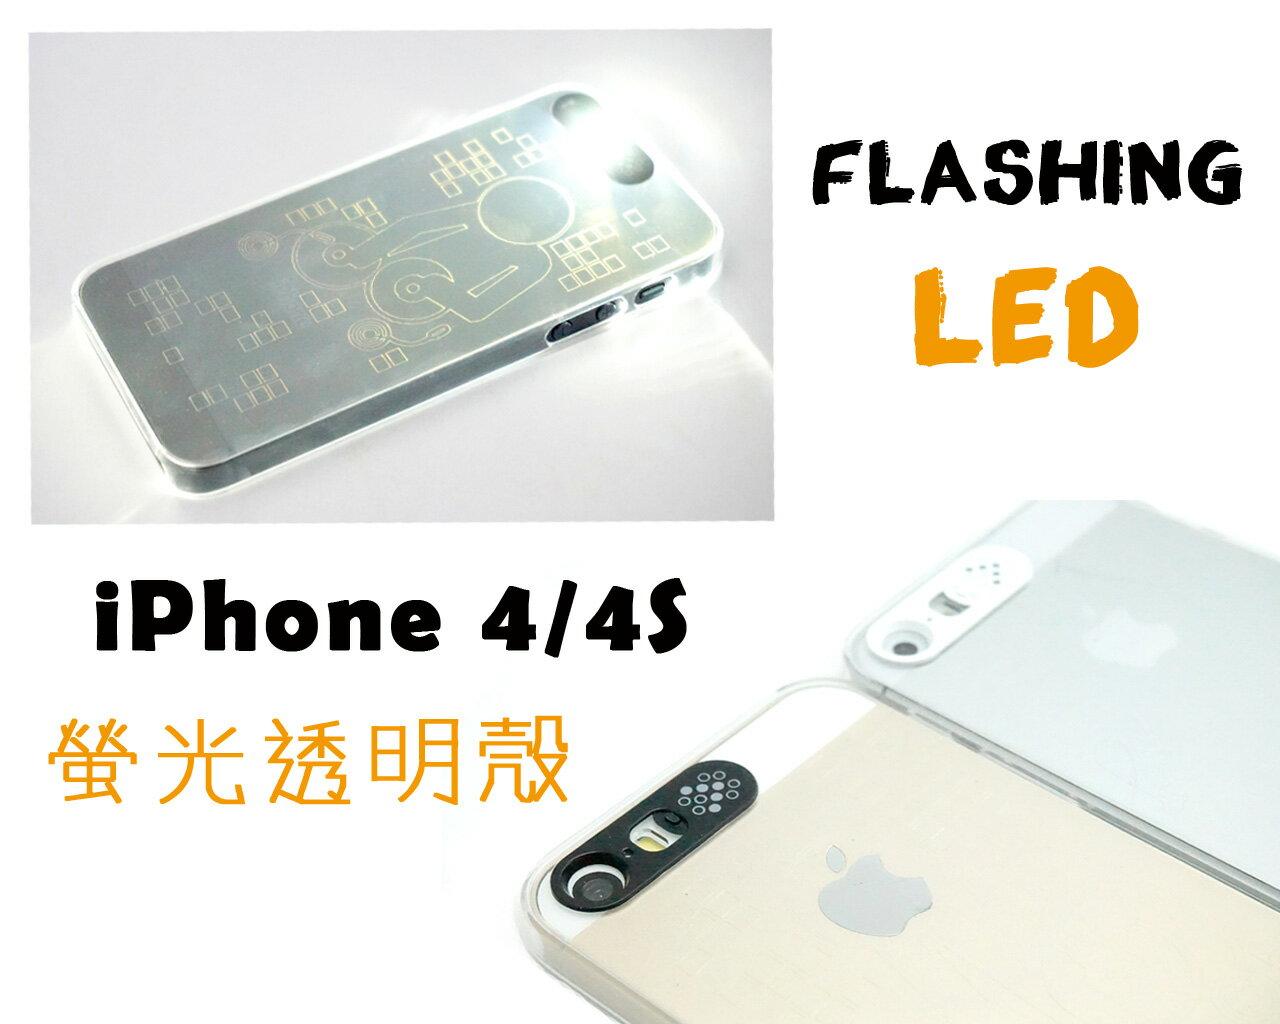 UNIPRO iPhone 4 4S LED來電閃爍 bling 螢光 透明 手機殼 保護套 酷炫閃光 Flash